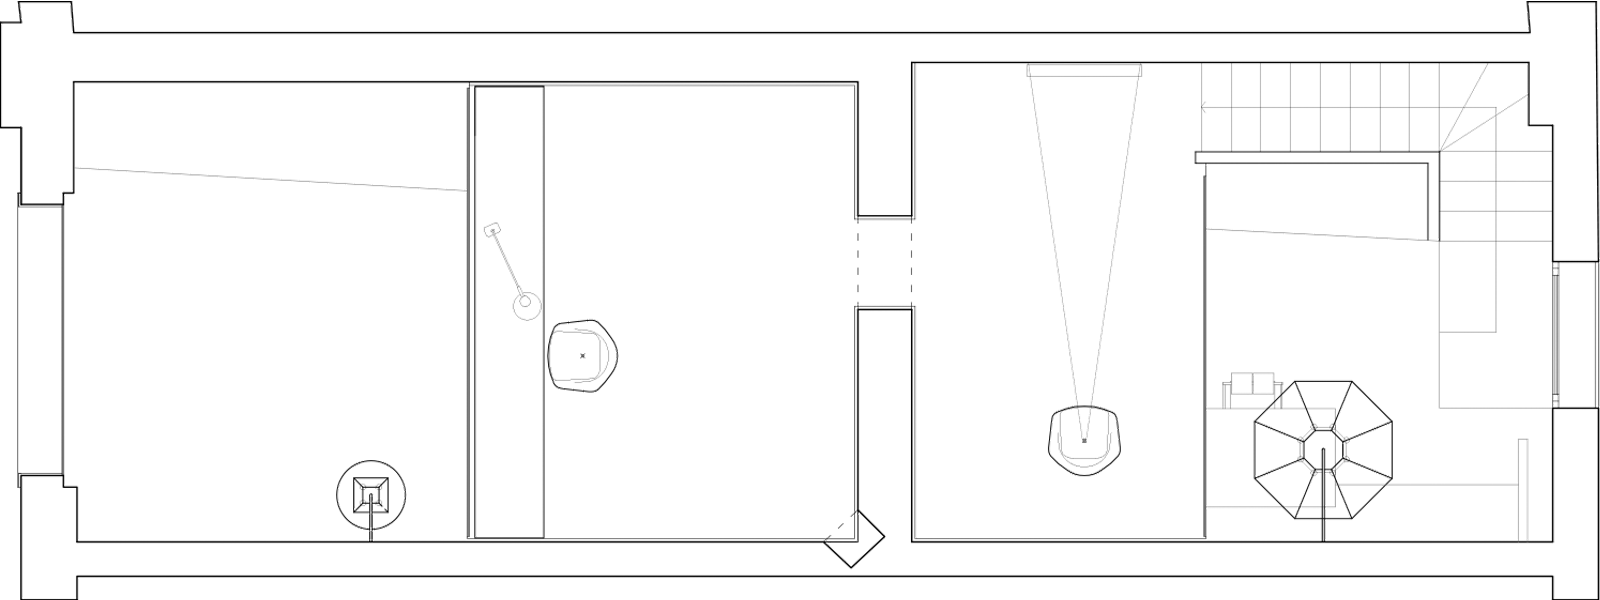 livello-info-p1